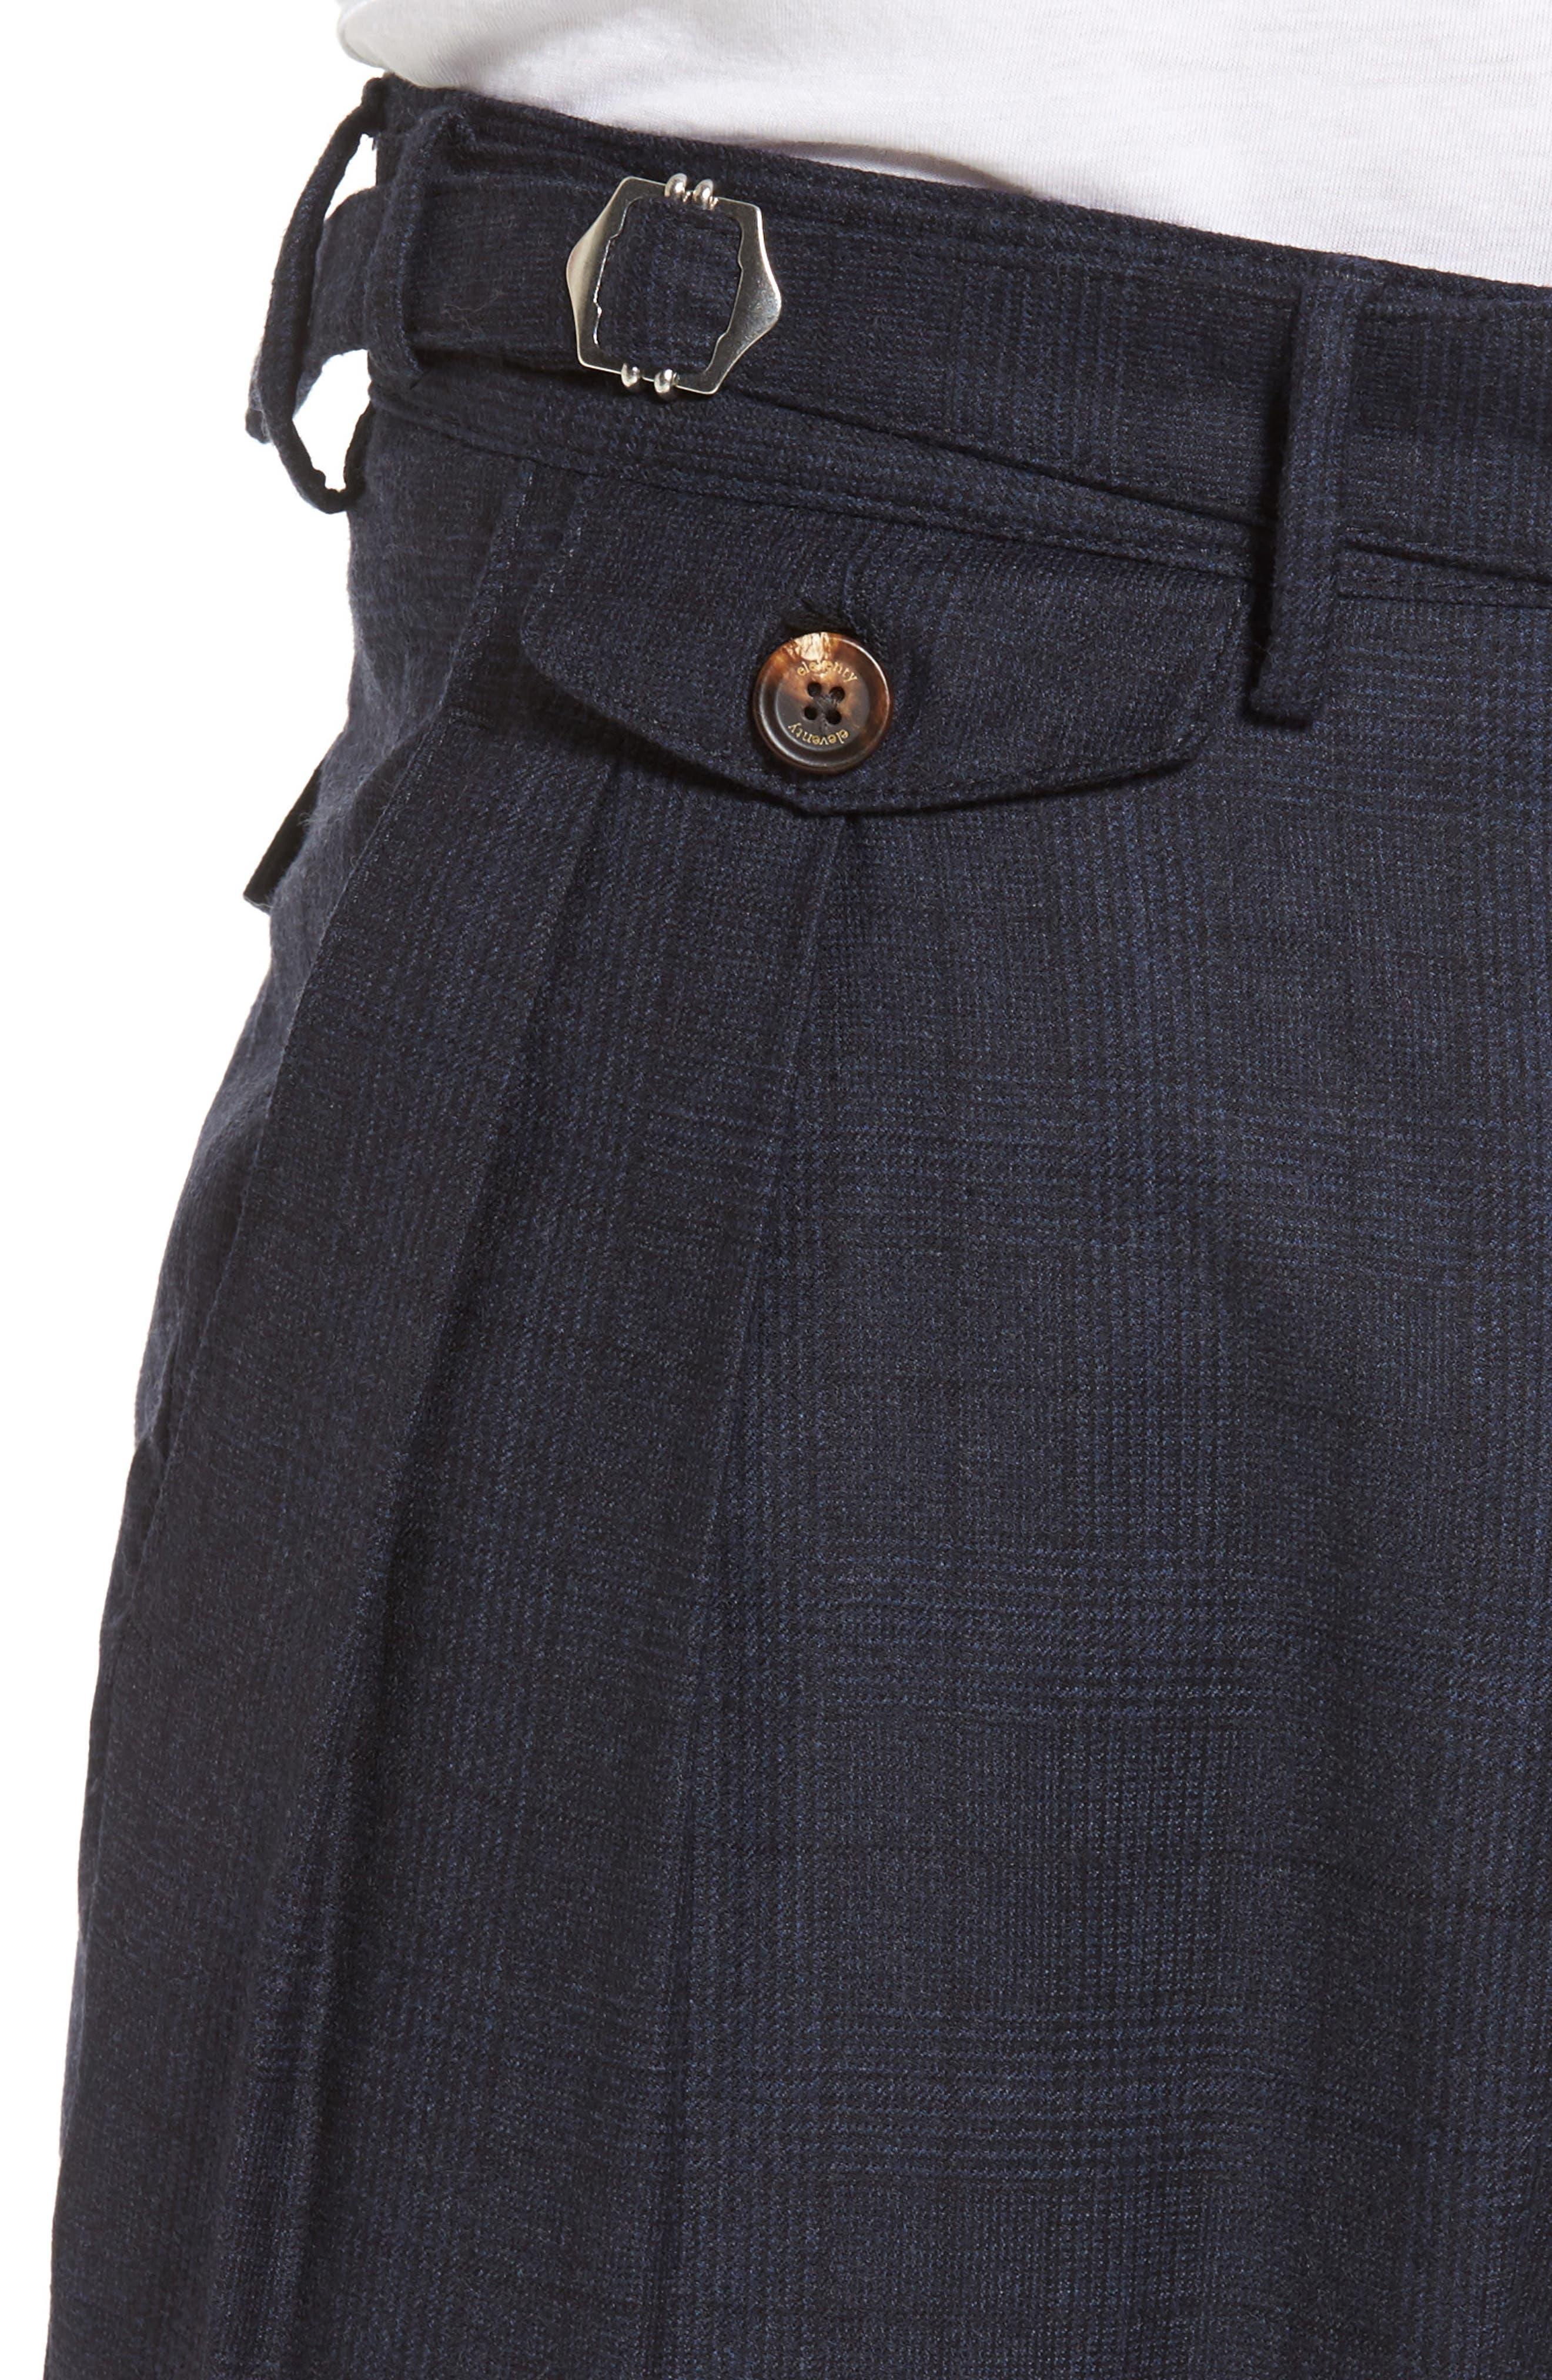 Glen Plaid Pleat Front Wool Pants,                             Alternate thumbnail 4, color,                             Navy